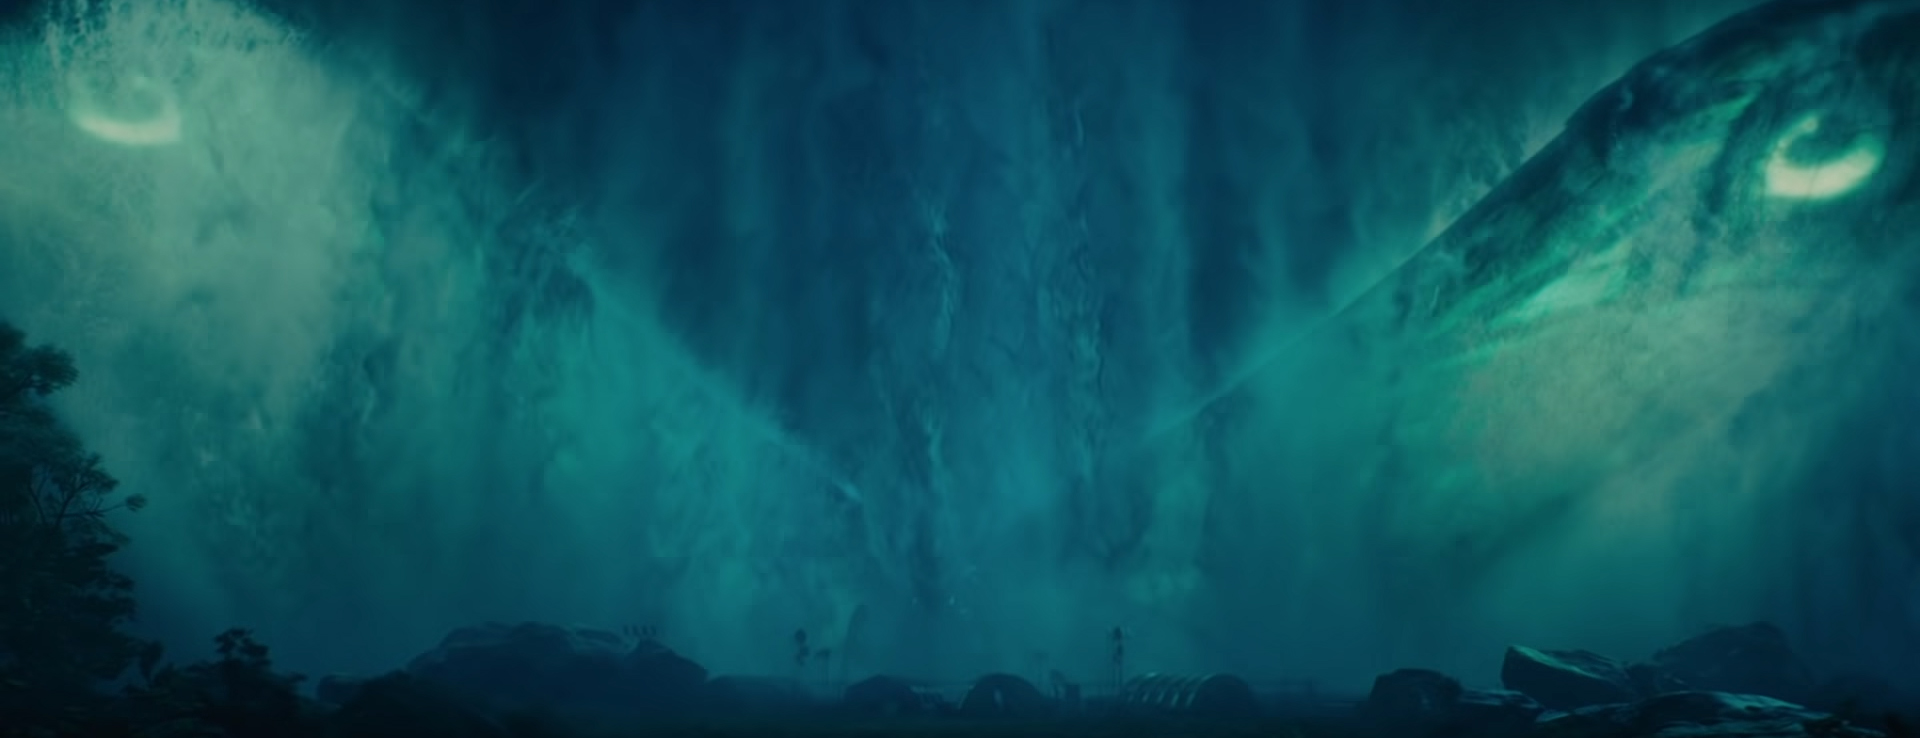 Godzilla: King of the Monsters. Image Credit: Warner Bros.